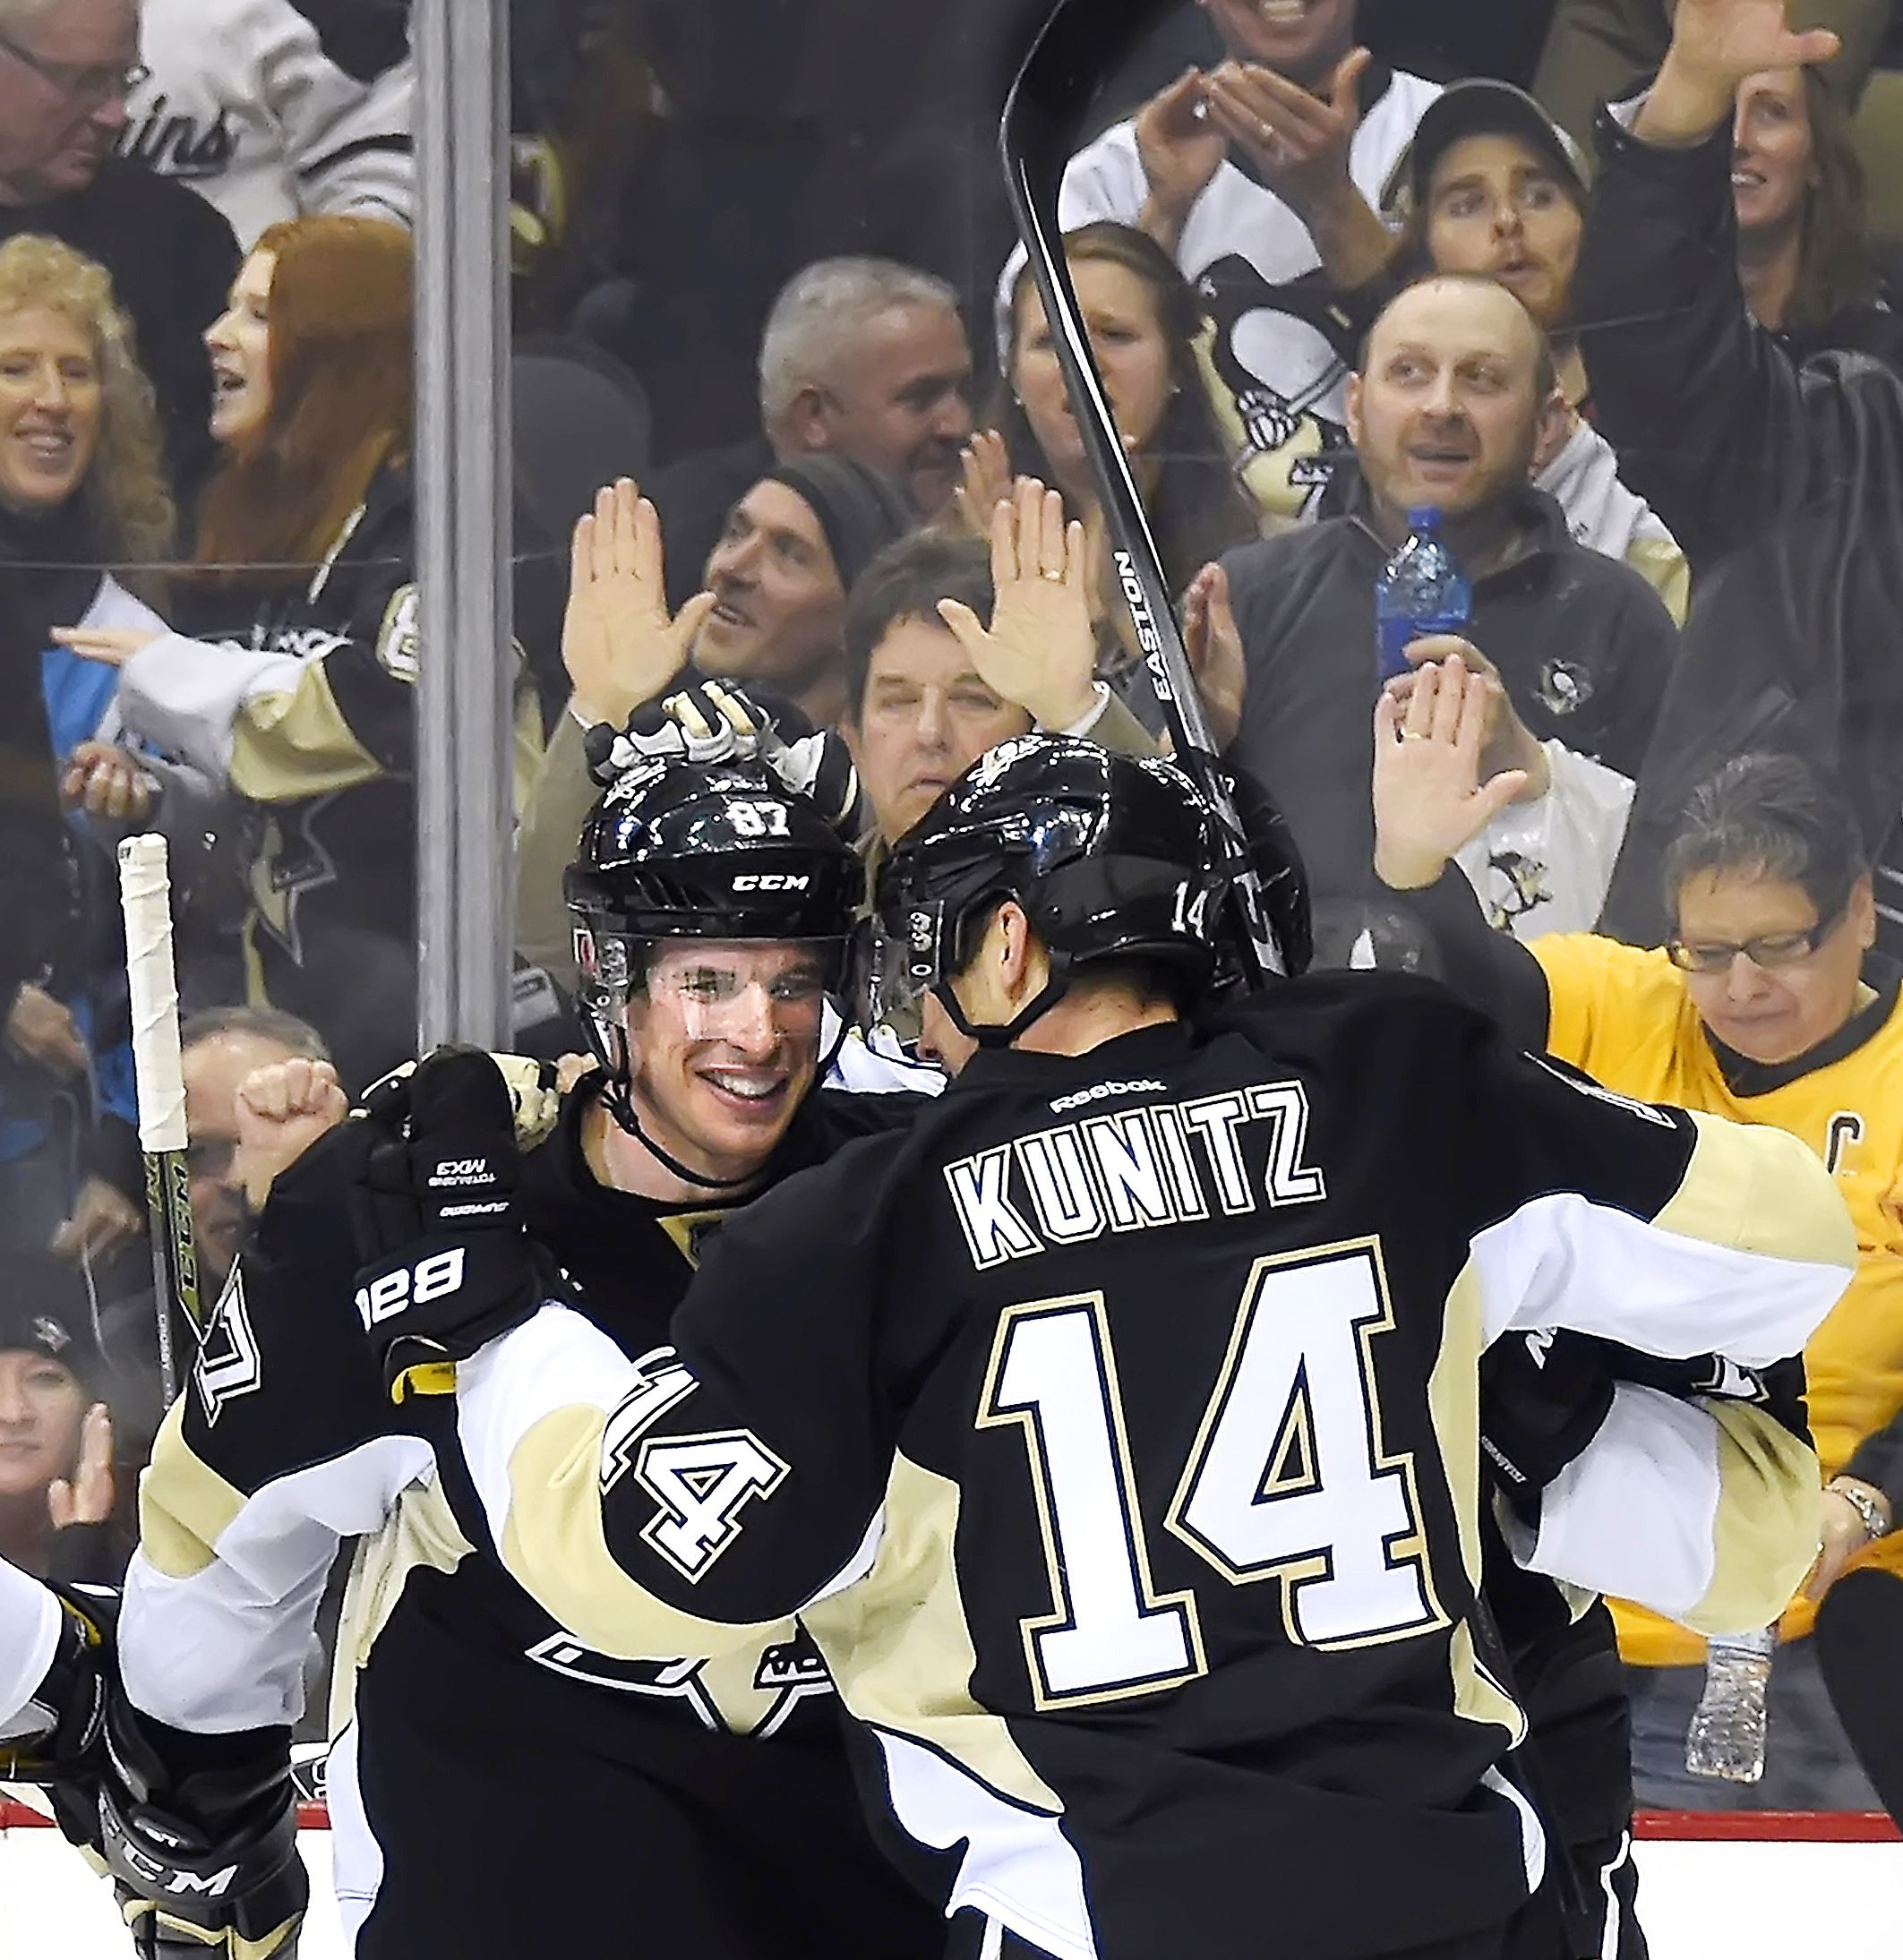 Penguins outlast Senators, 6-5, on Crosby's hat trick